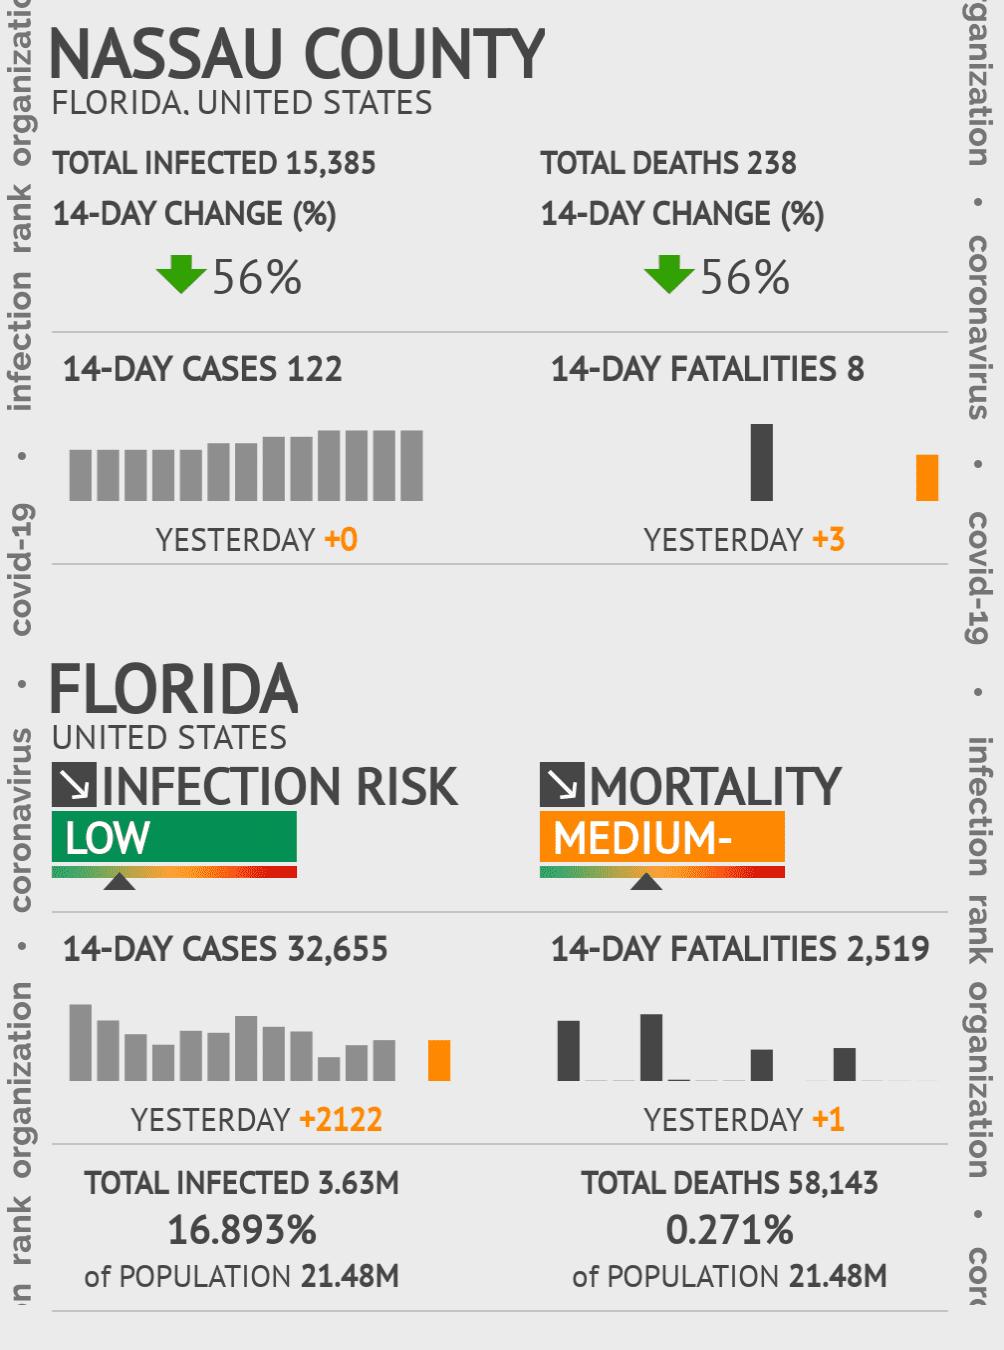 Nassau County Coronavirus Covid-19 Risk of Infection on October 19, 2020